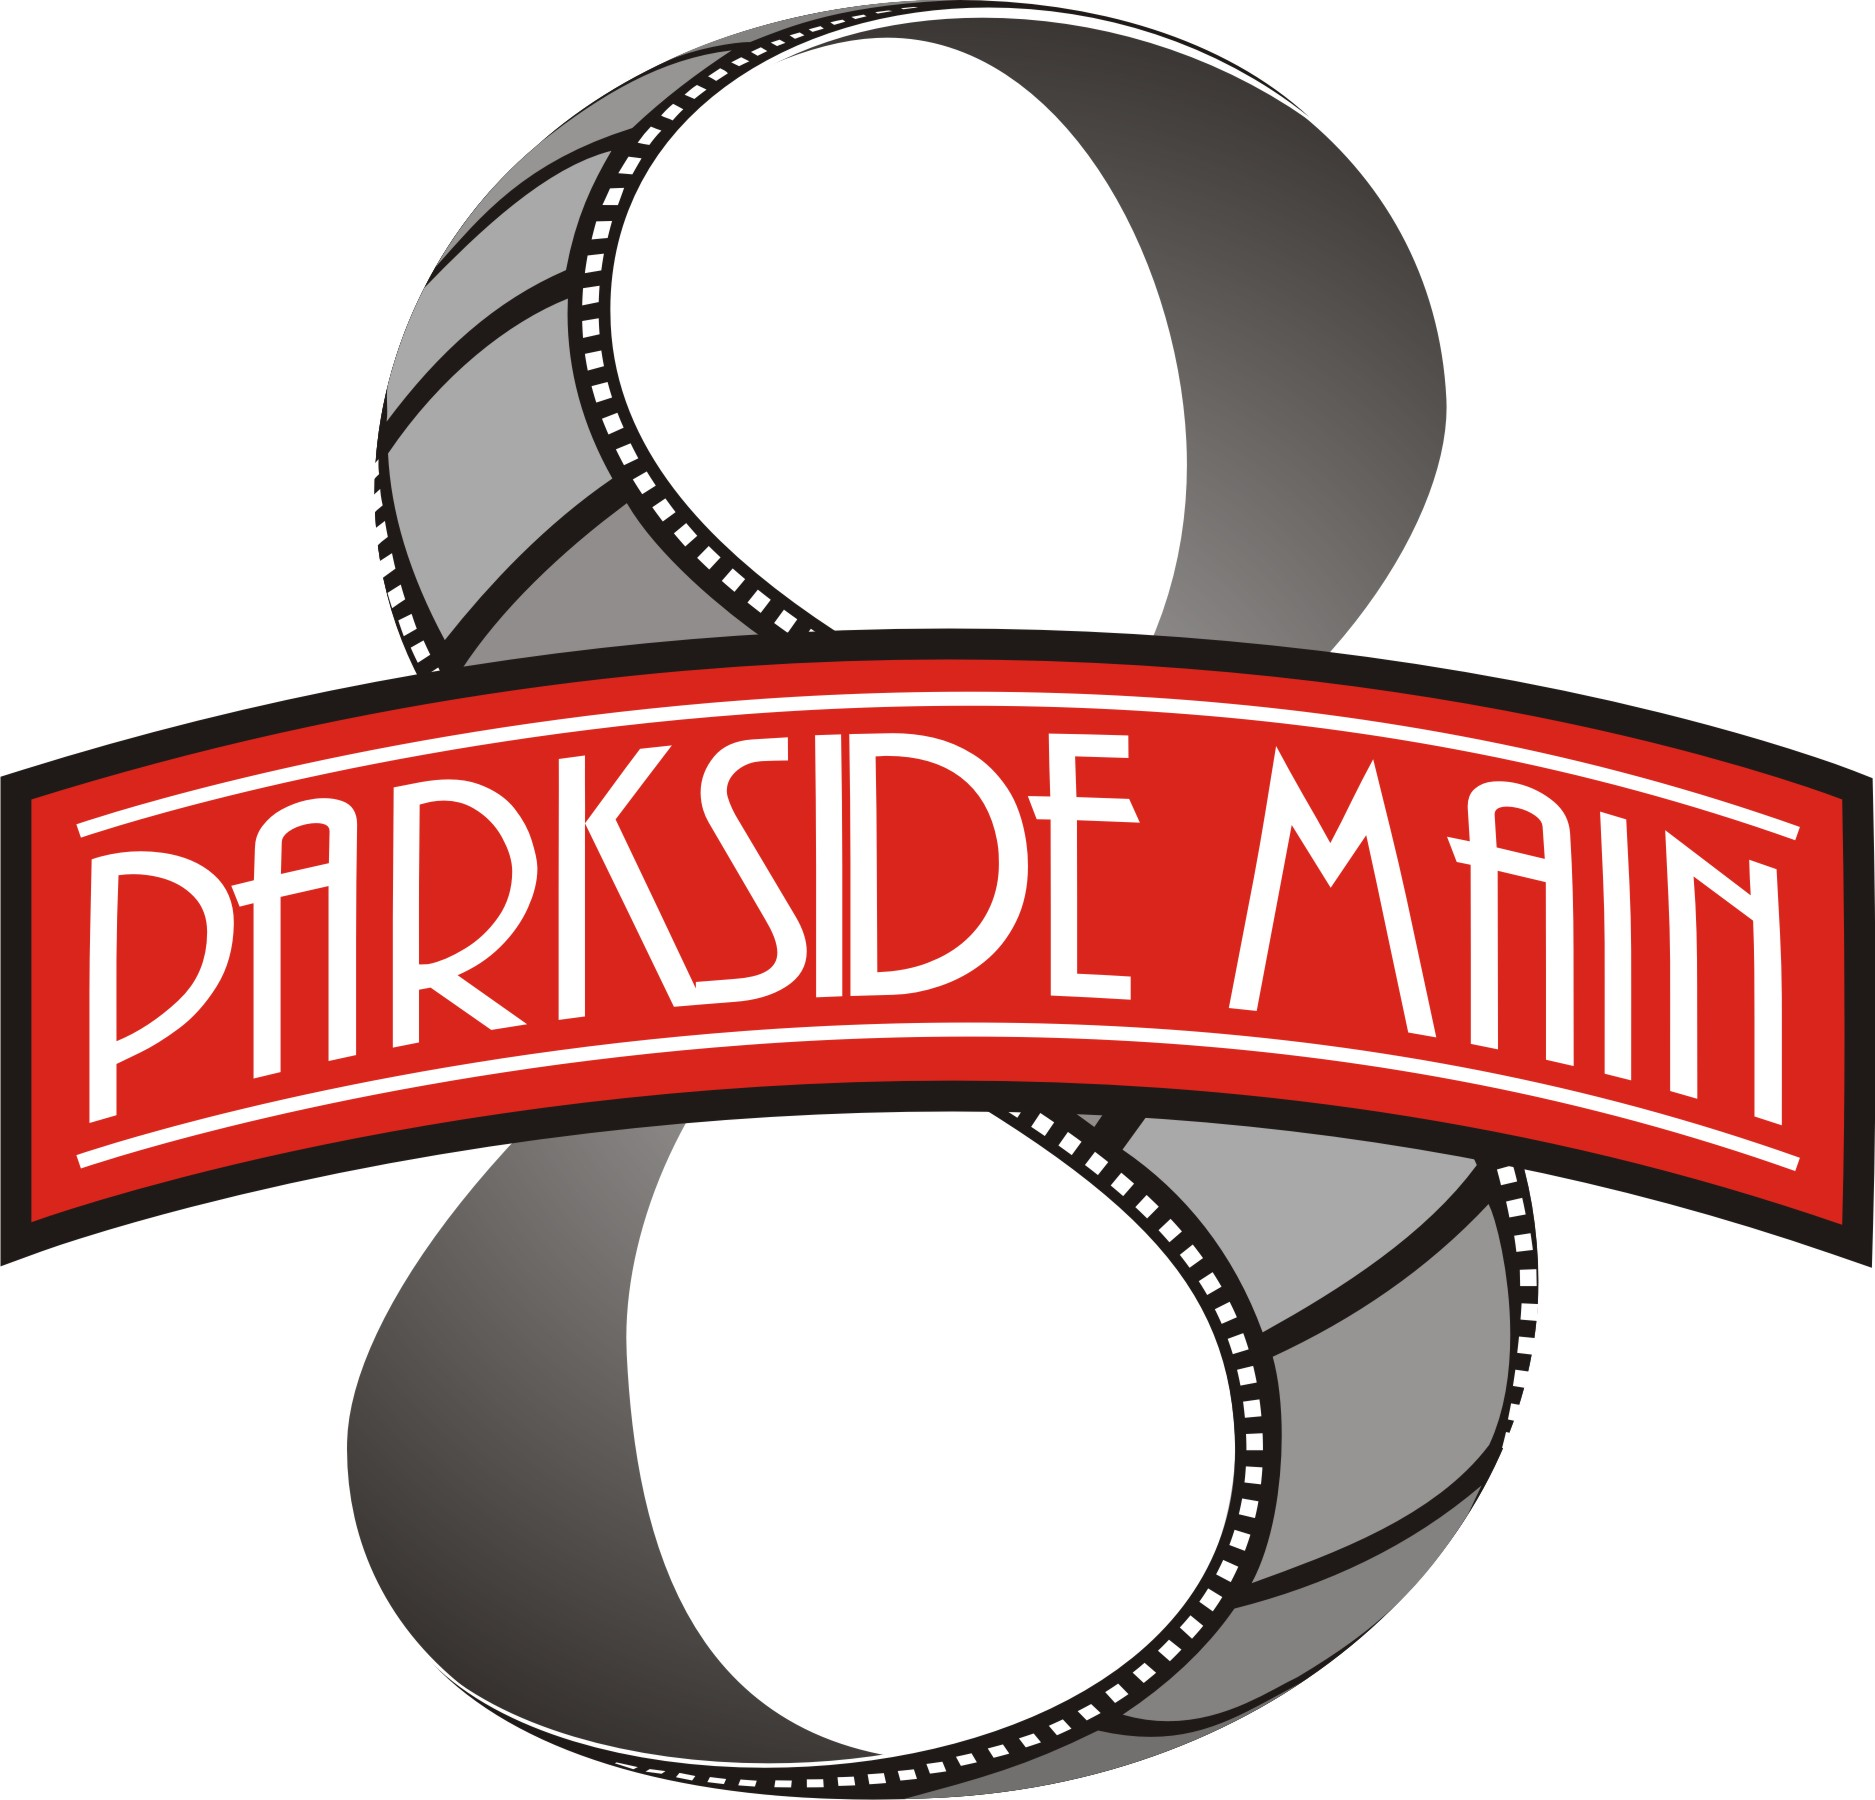 Parkside Main 8 logo.jpg